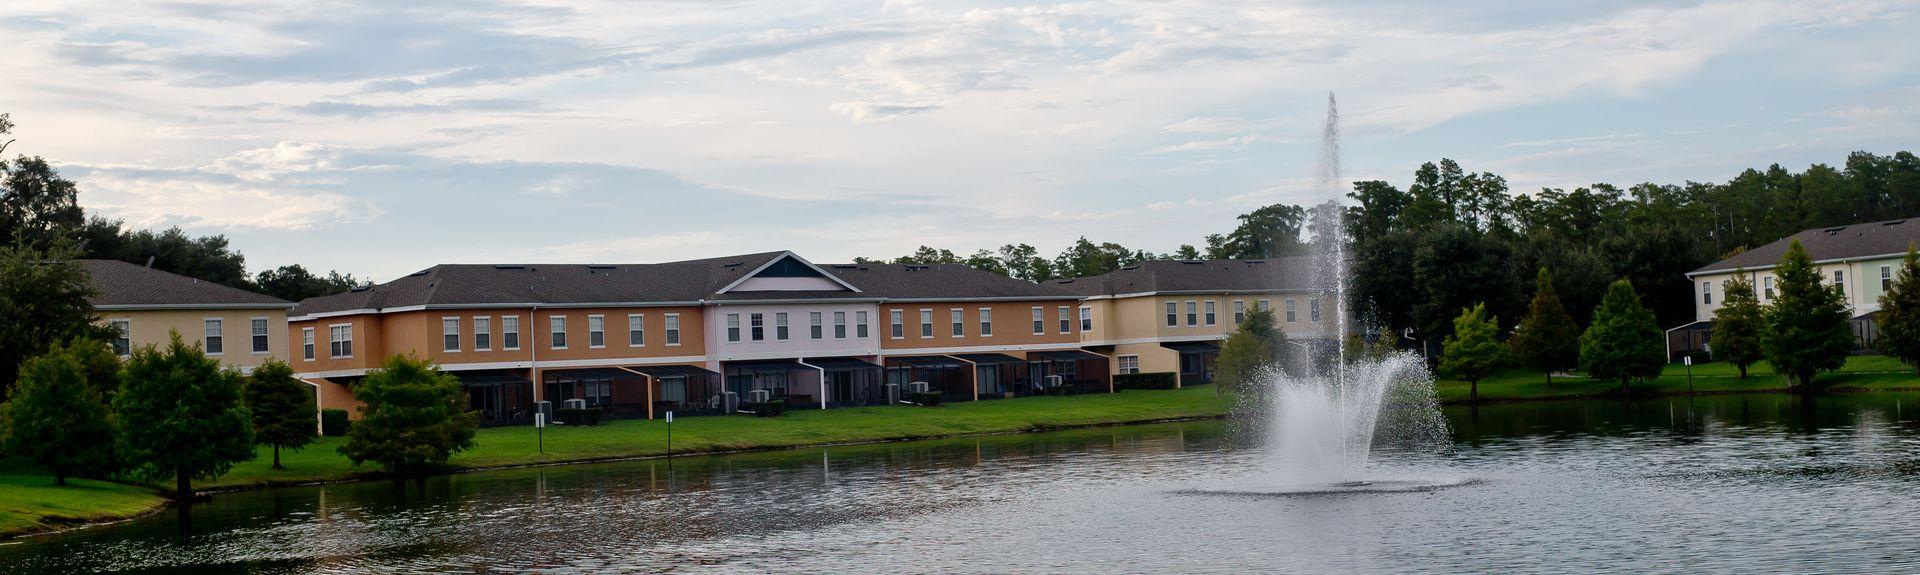 Venetian Bay Villages, Kissimmee, FL, USA